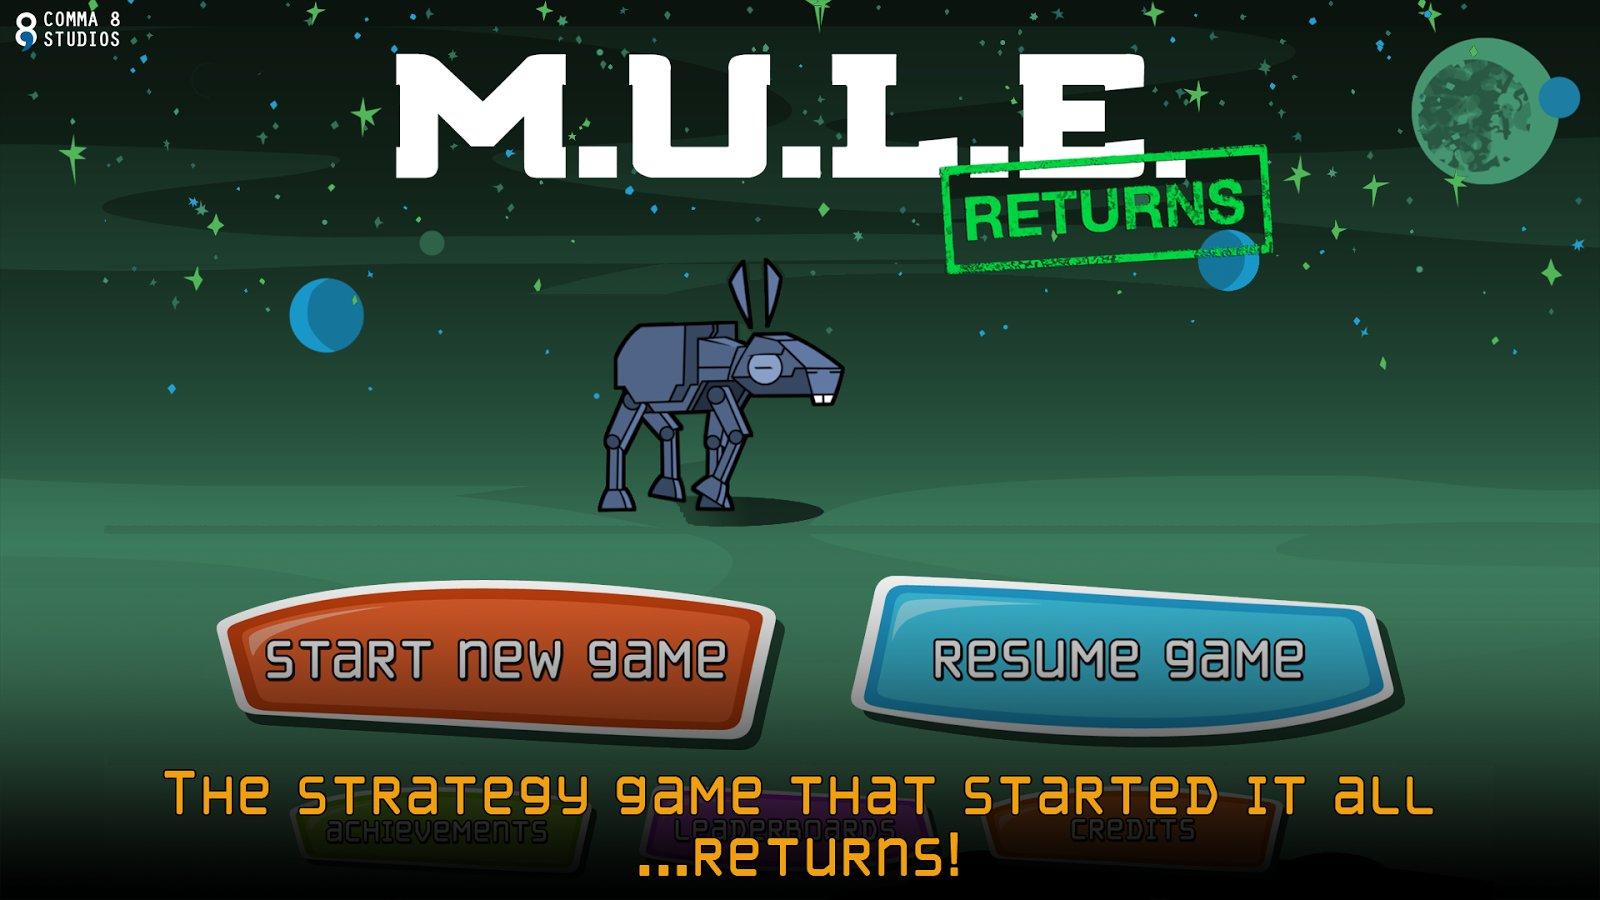 MULE Returns скачать 1.0.1 на Android Mule Returns